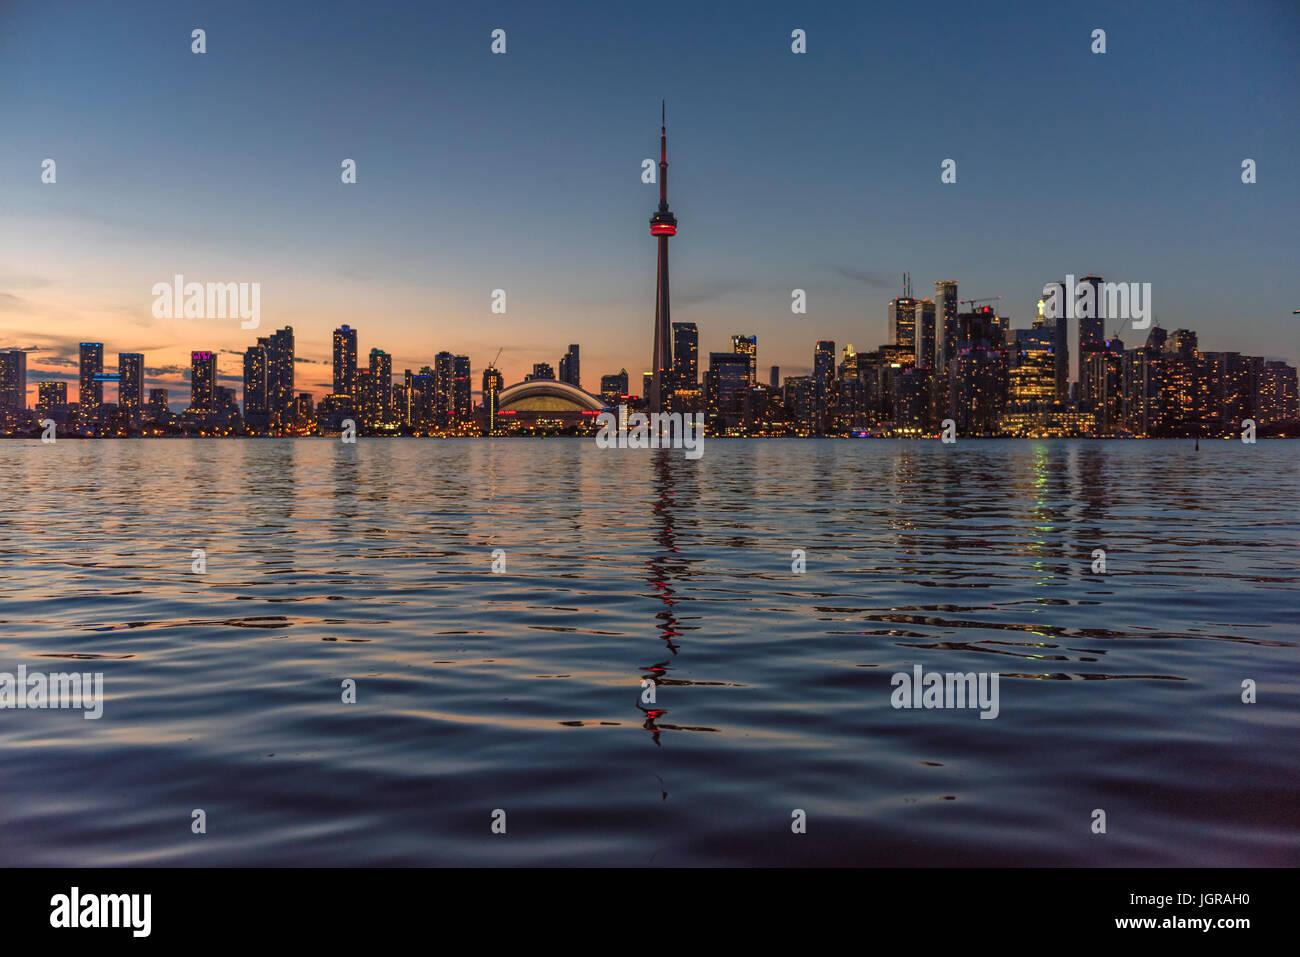 Toronto skyline al tramonto, Canada Immagini Stock